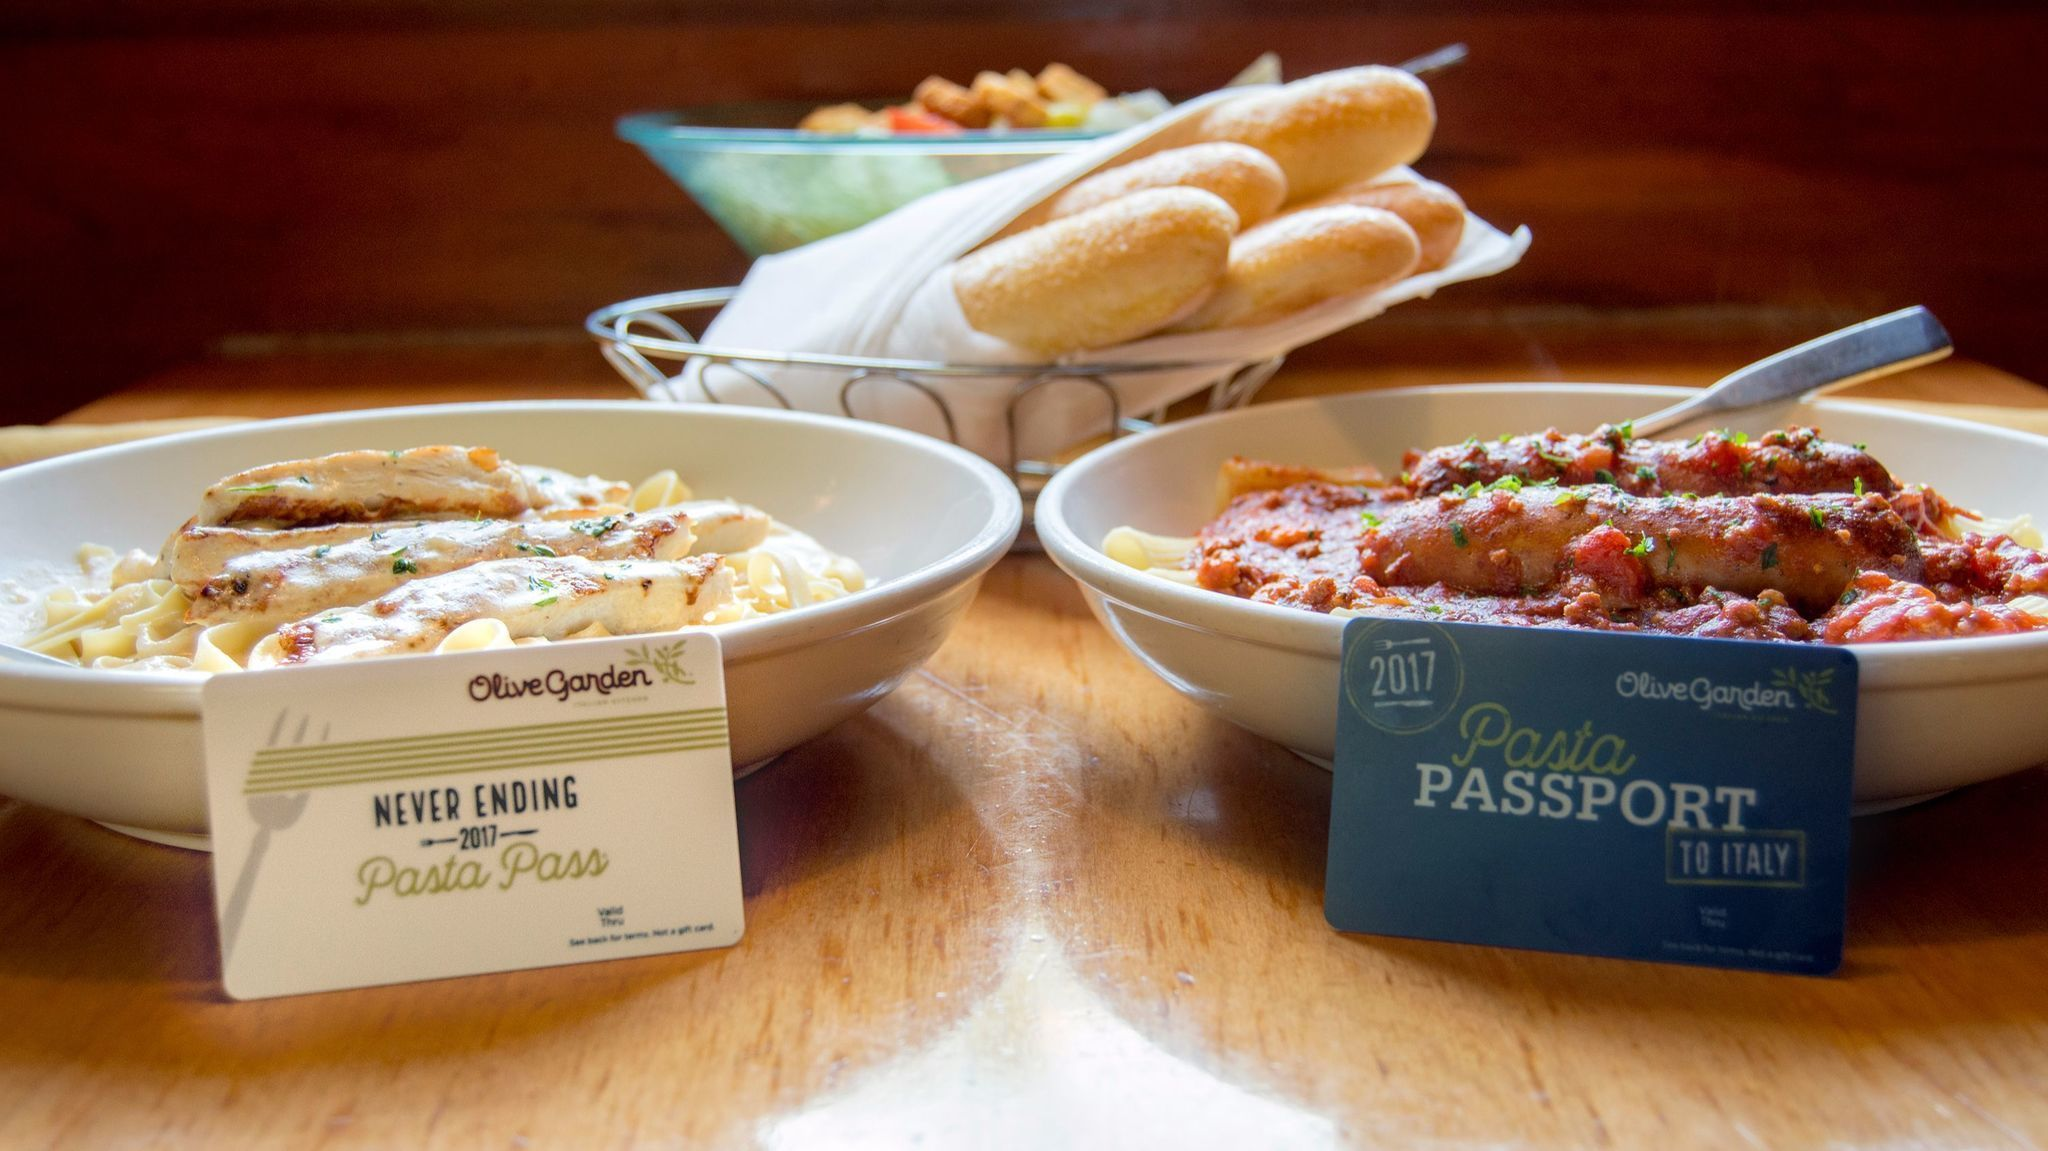 Olive Garden brings back pasta pass, on sale Thursday - Orlando Sentinel